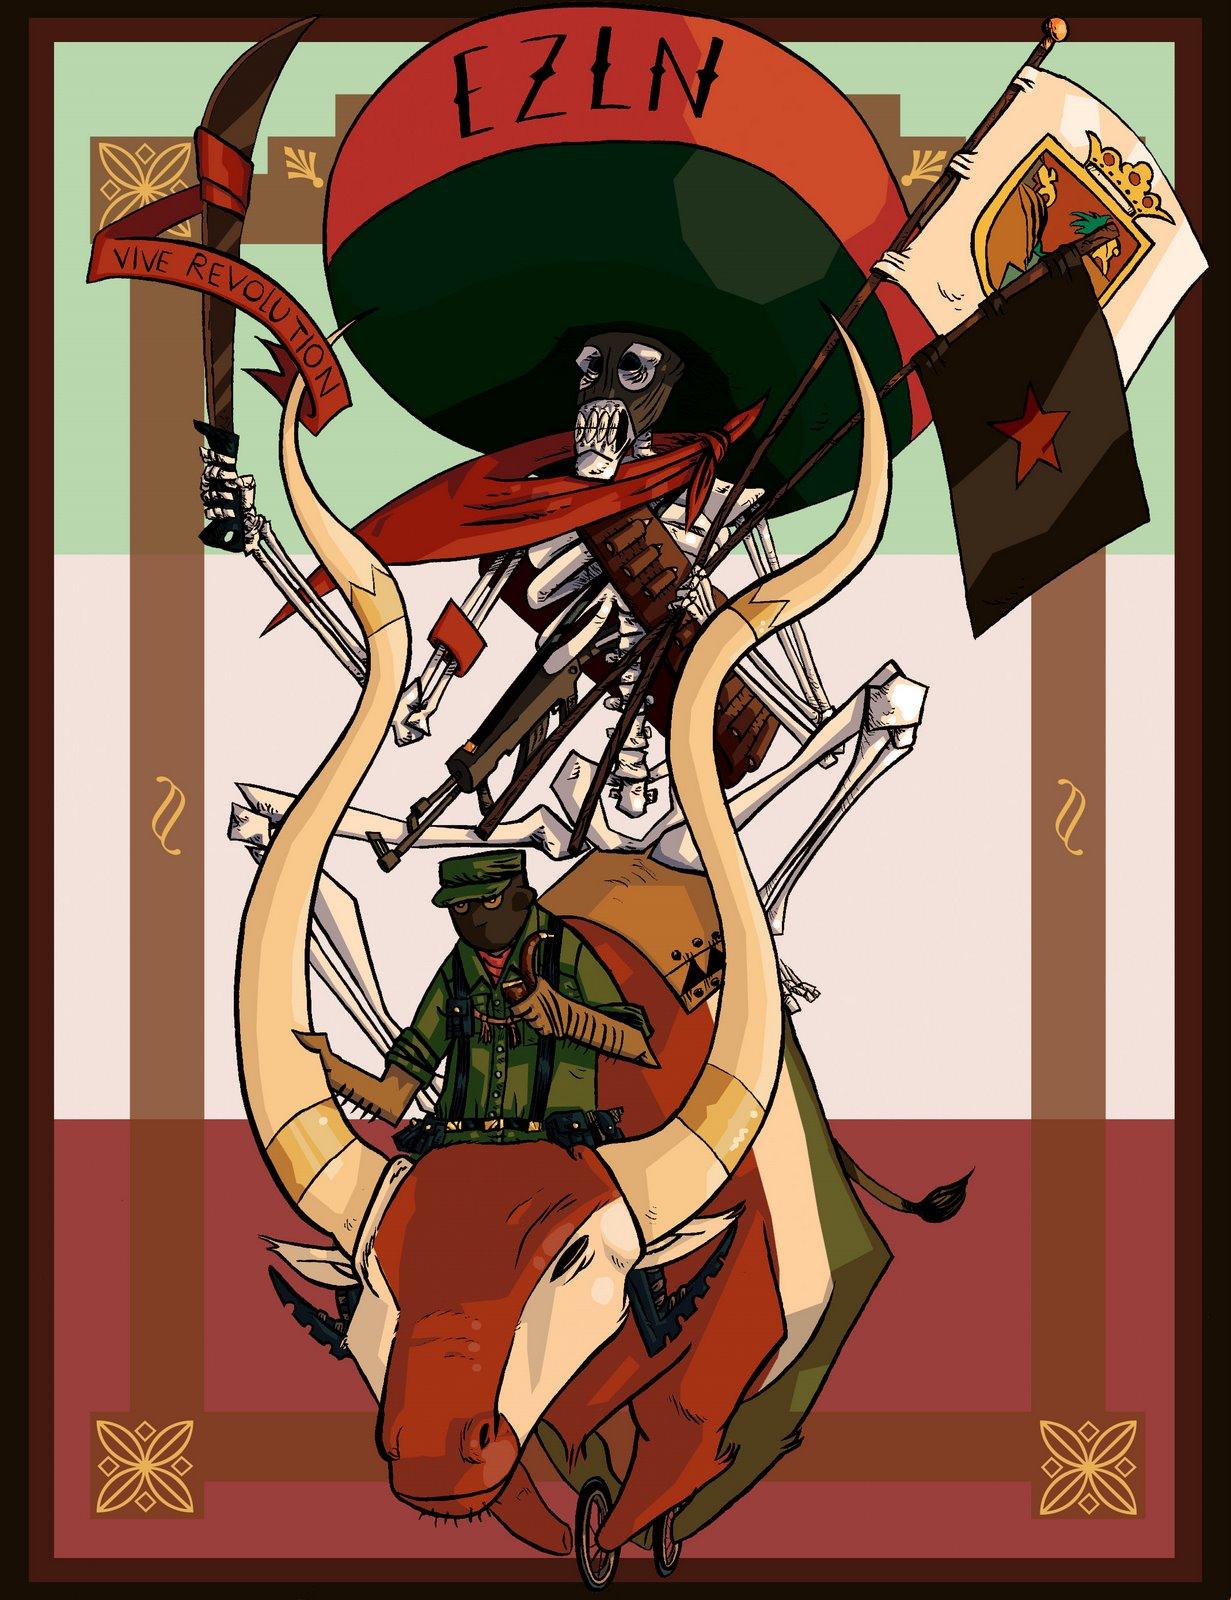 Viva EZLN